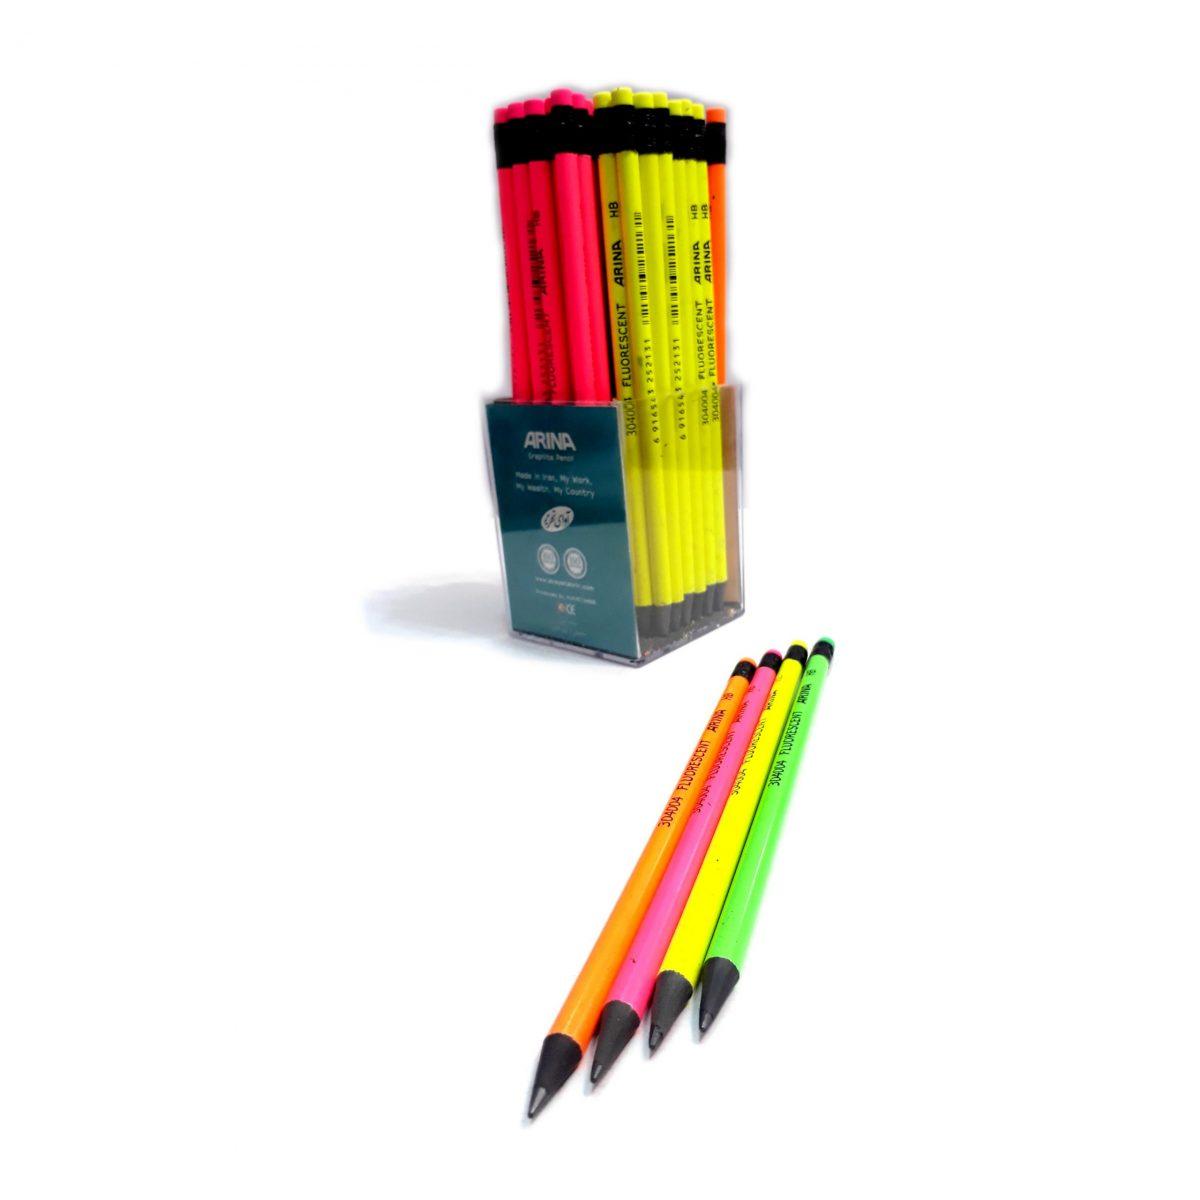 مداد مشکی ارنیا پاک کن دار